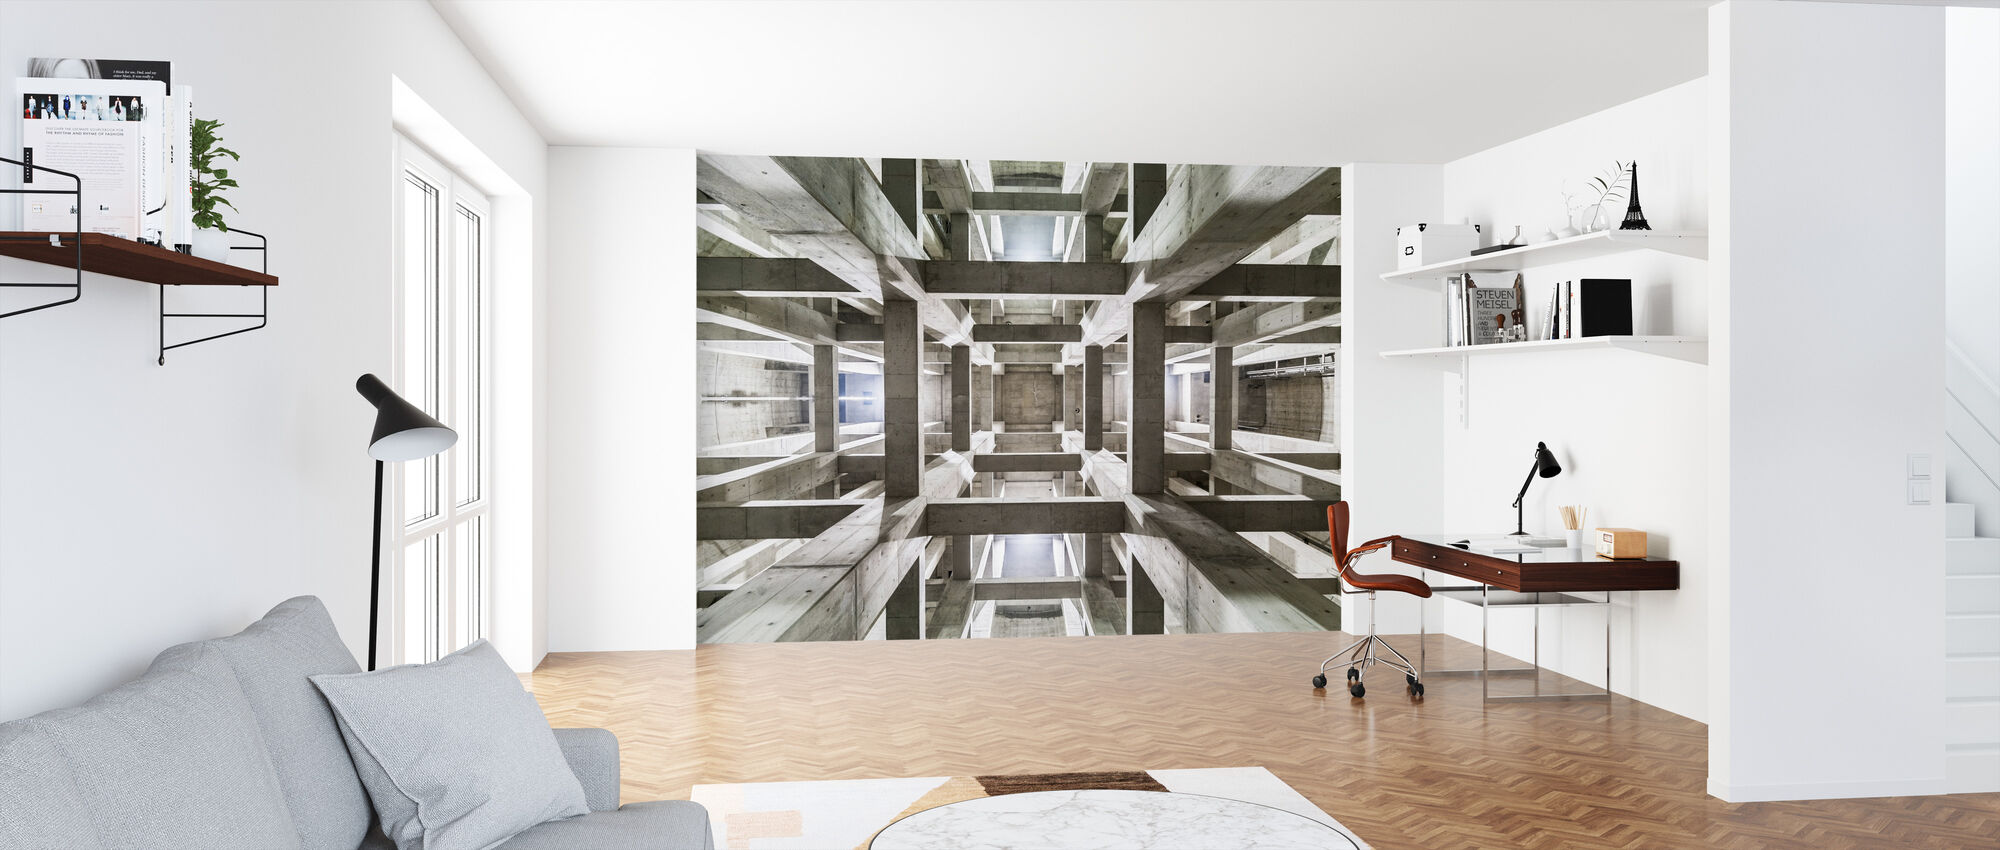 Ceiling - Wallpaper - Office